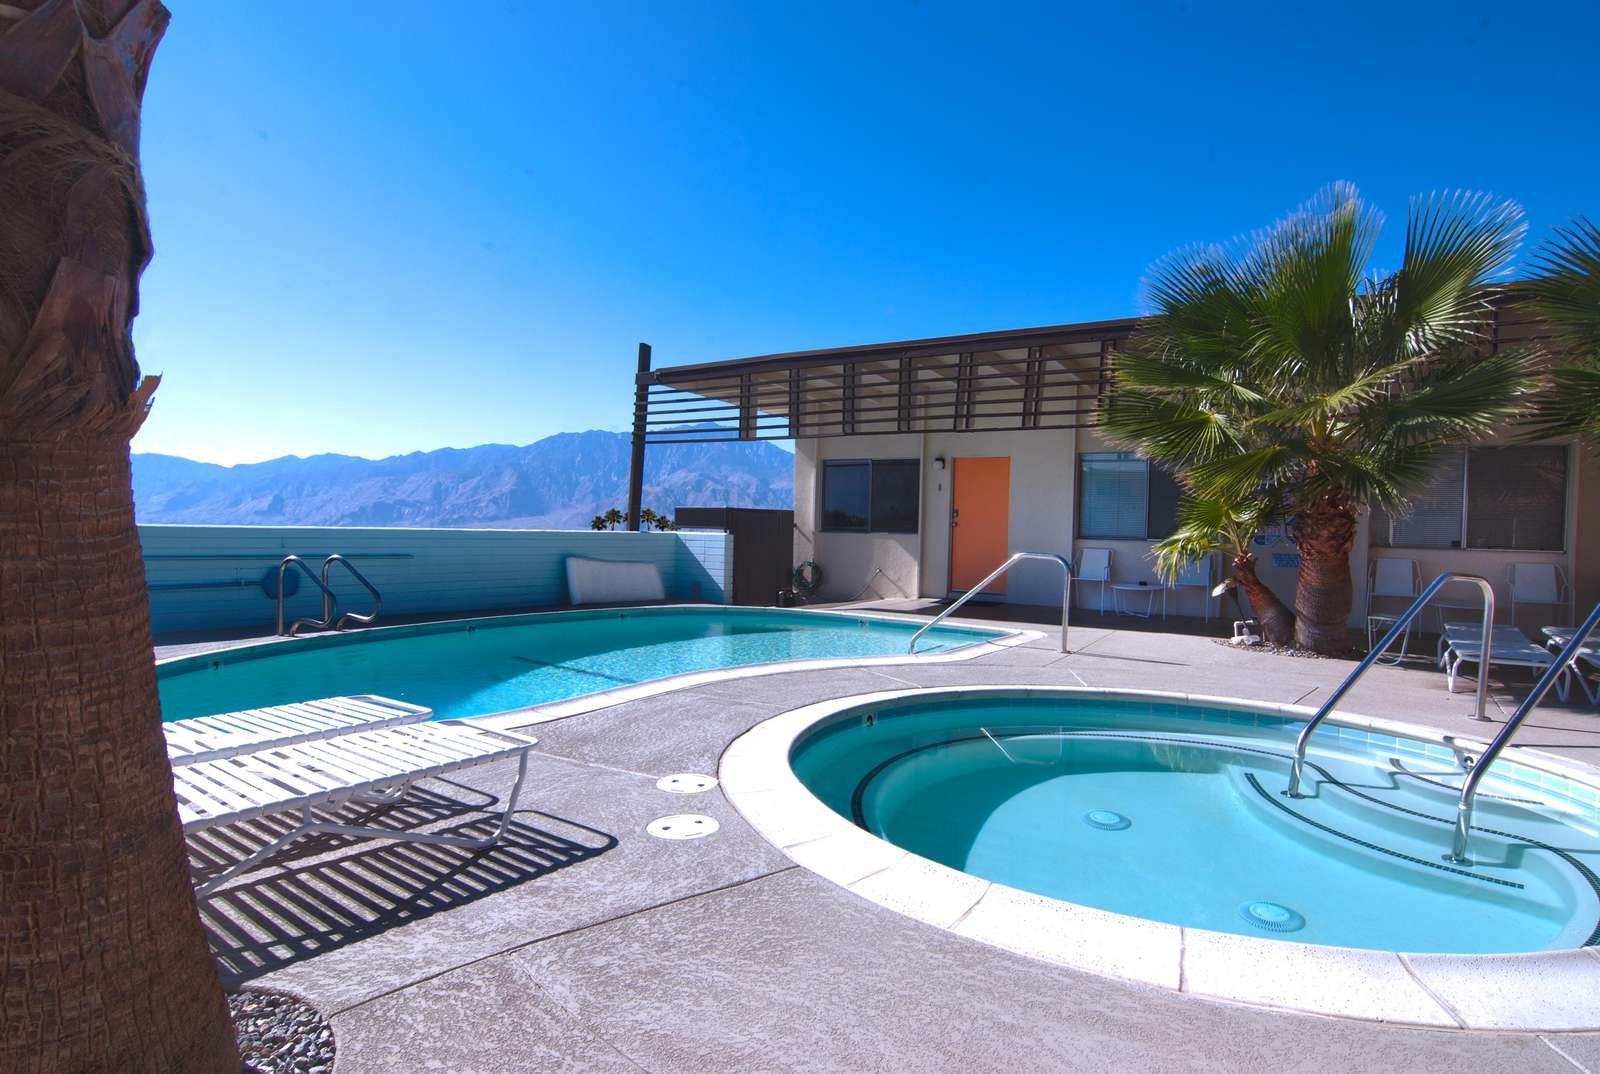 Pool deck, mountain view